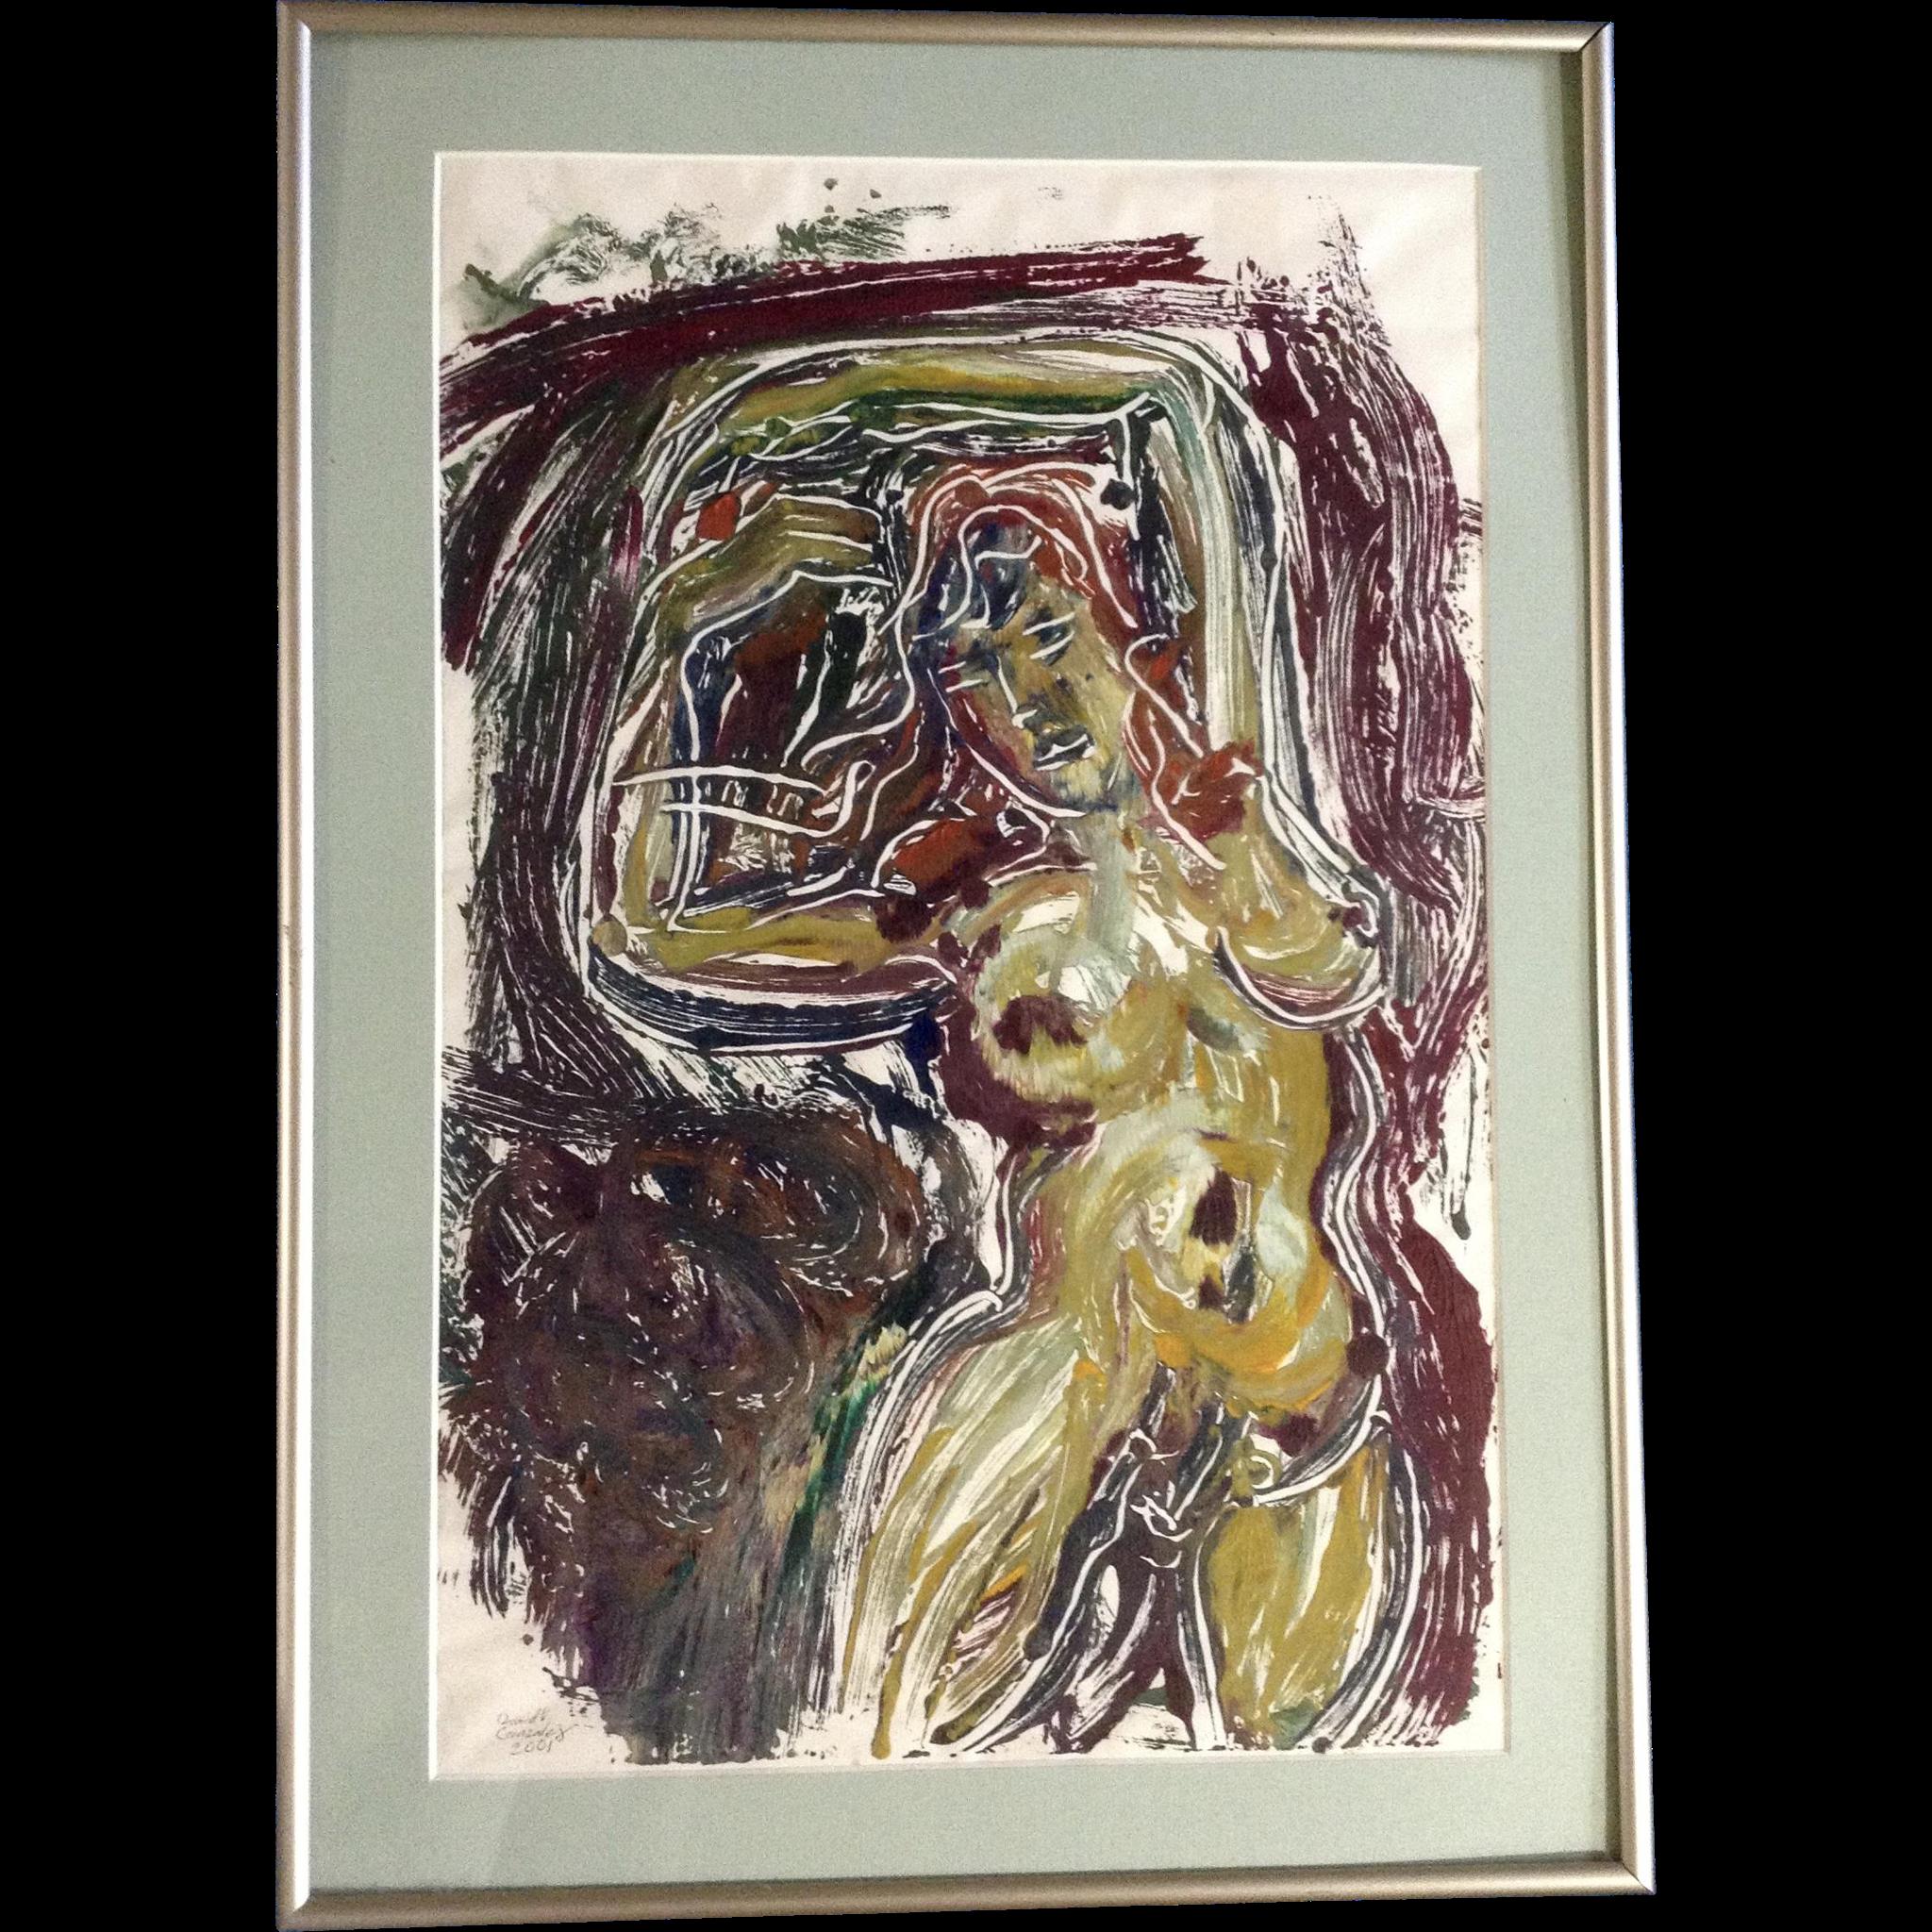 Items similar to WIne Painting on Canvas - Original